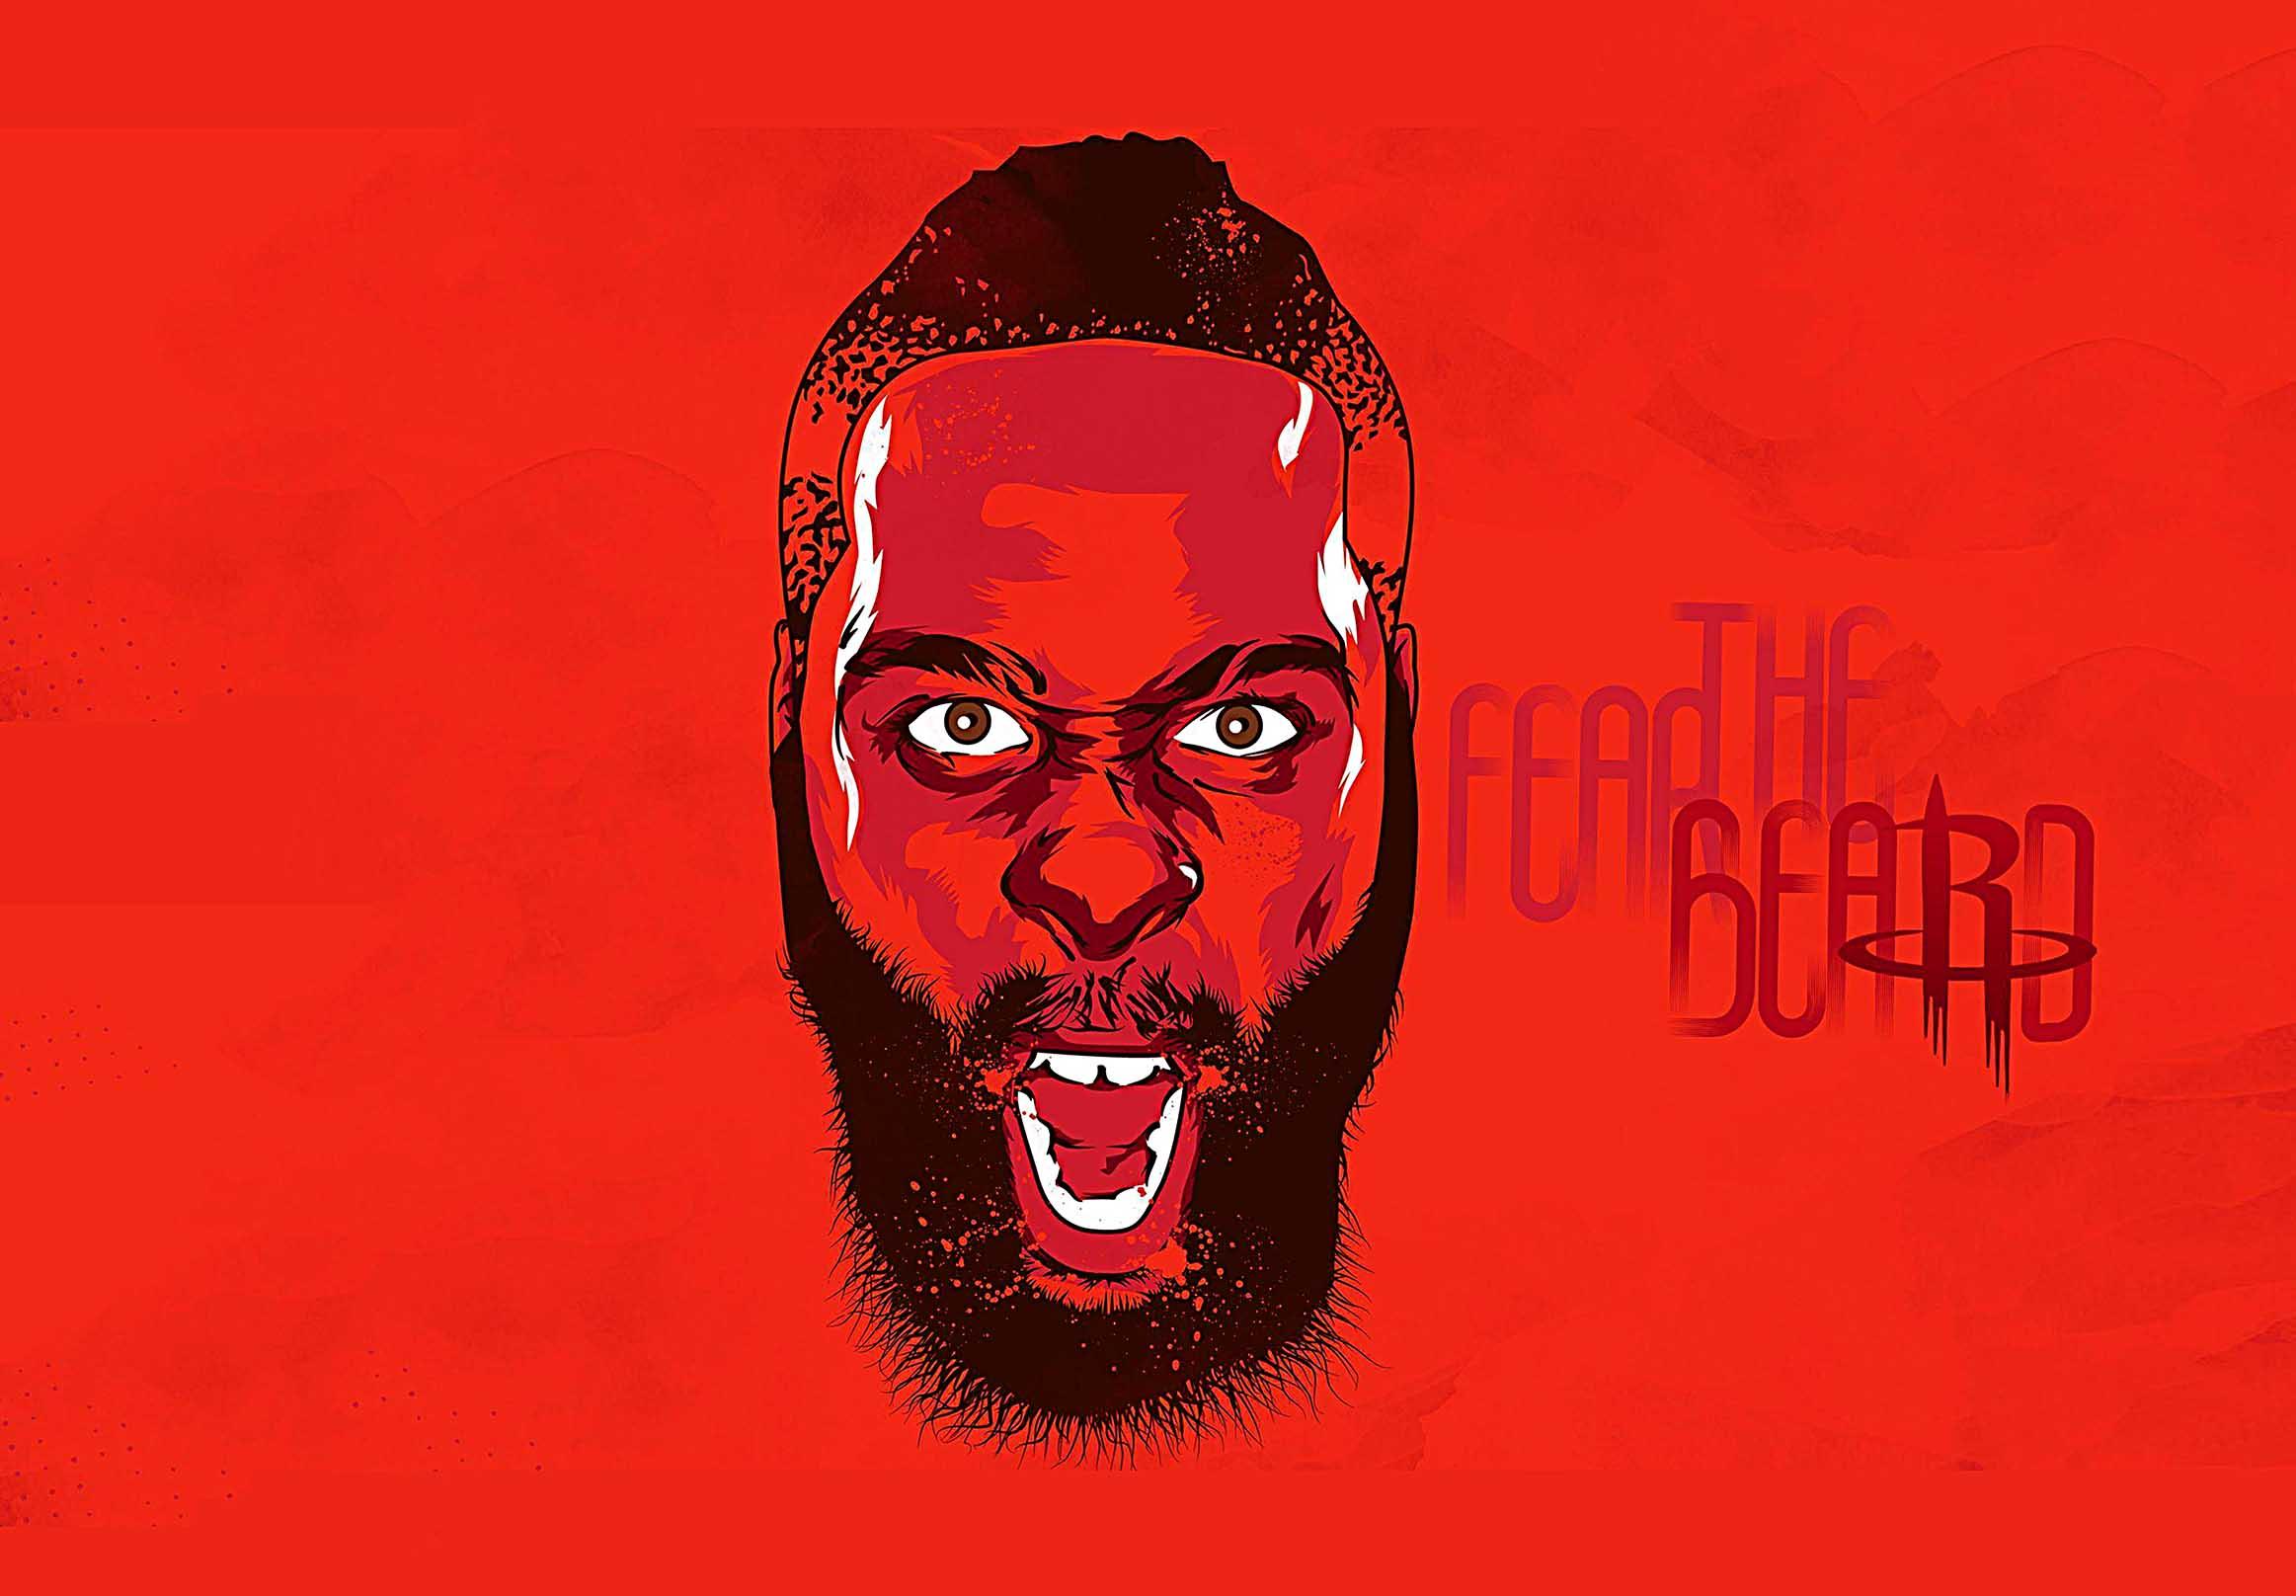 Houston Rockets Fear The Beard Canvas Tablo (Nba-canvas-hardenbeard)